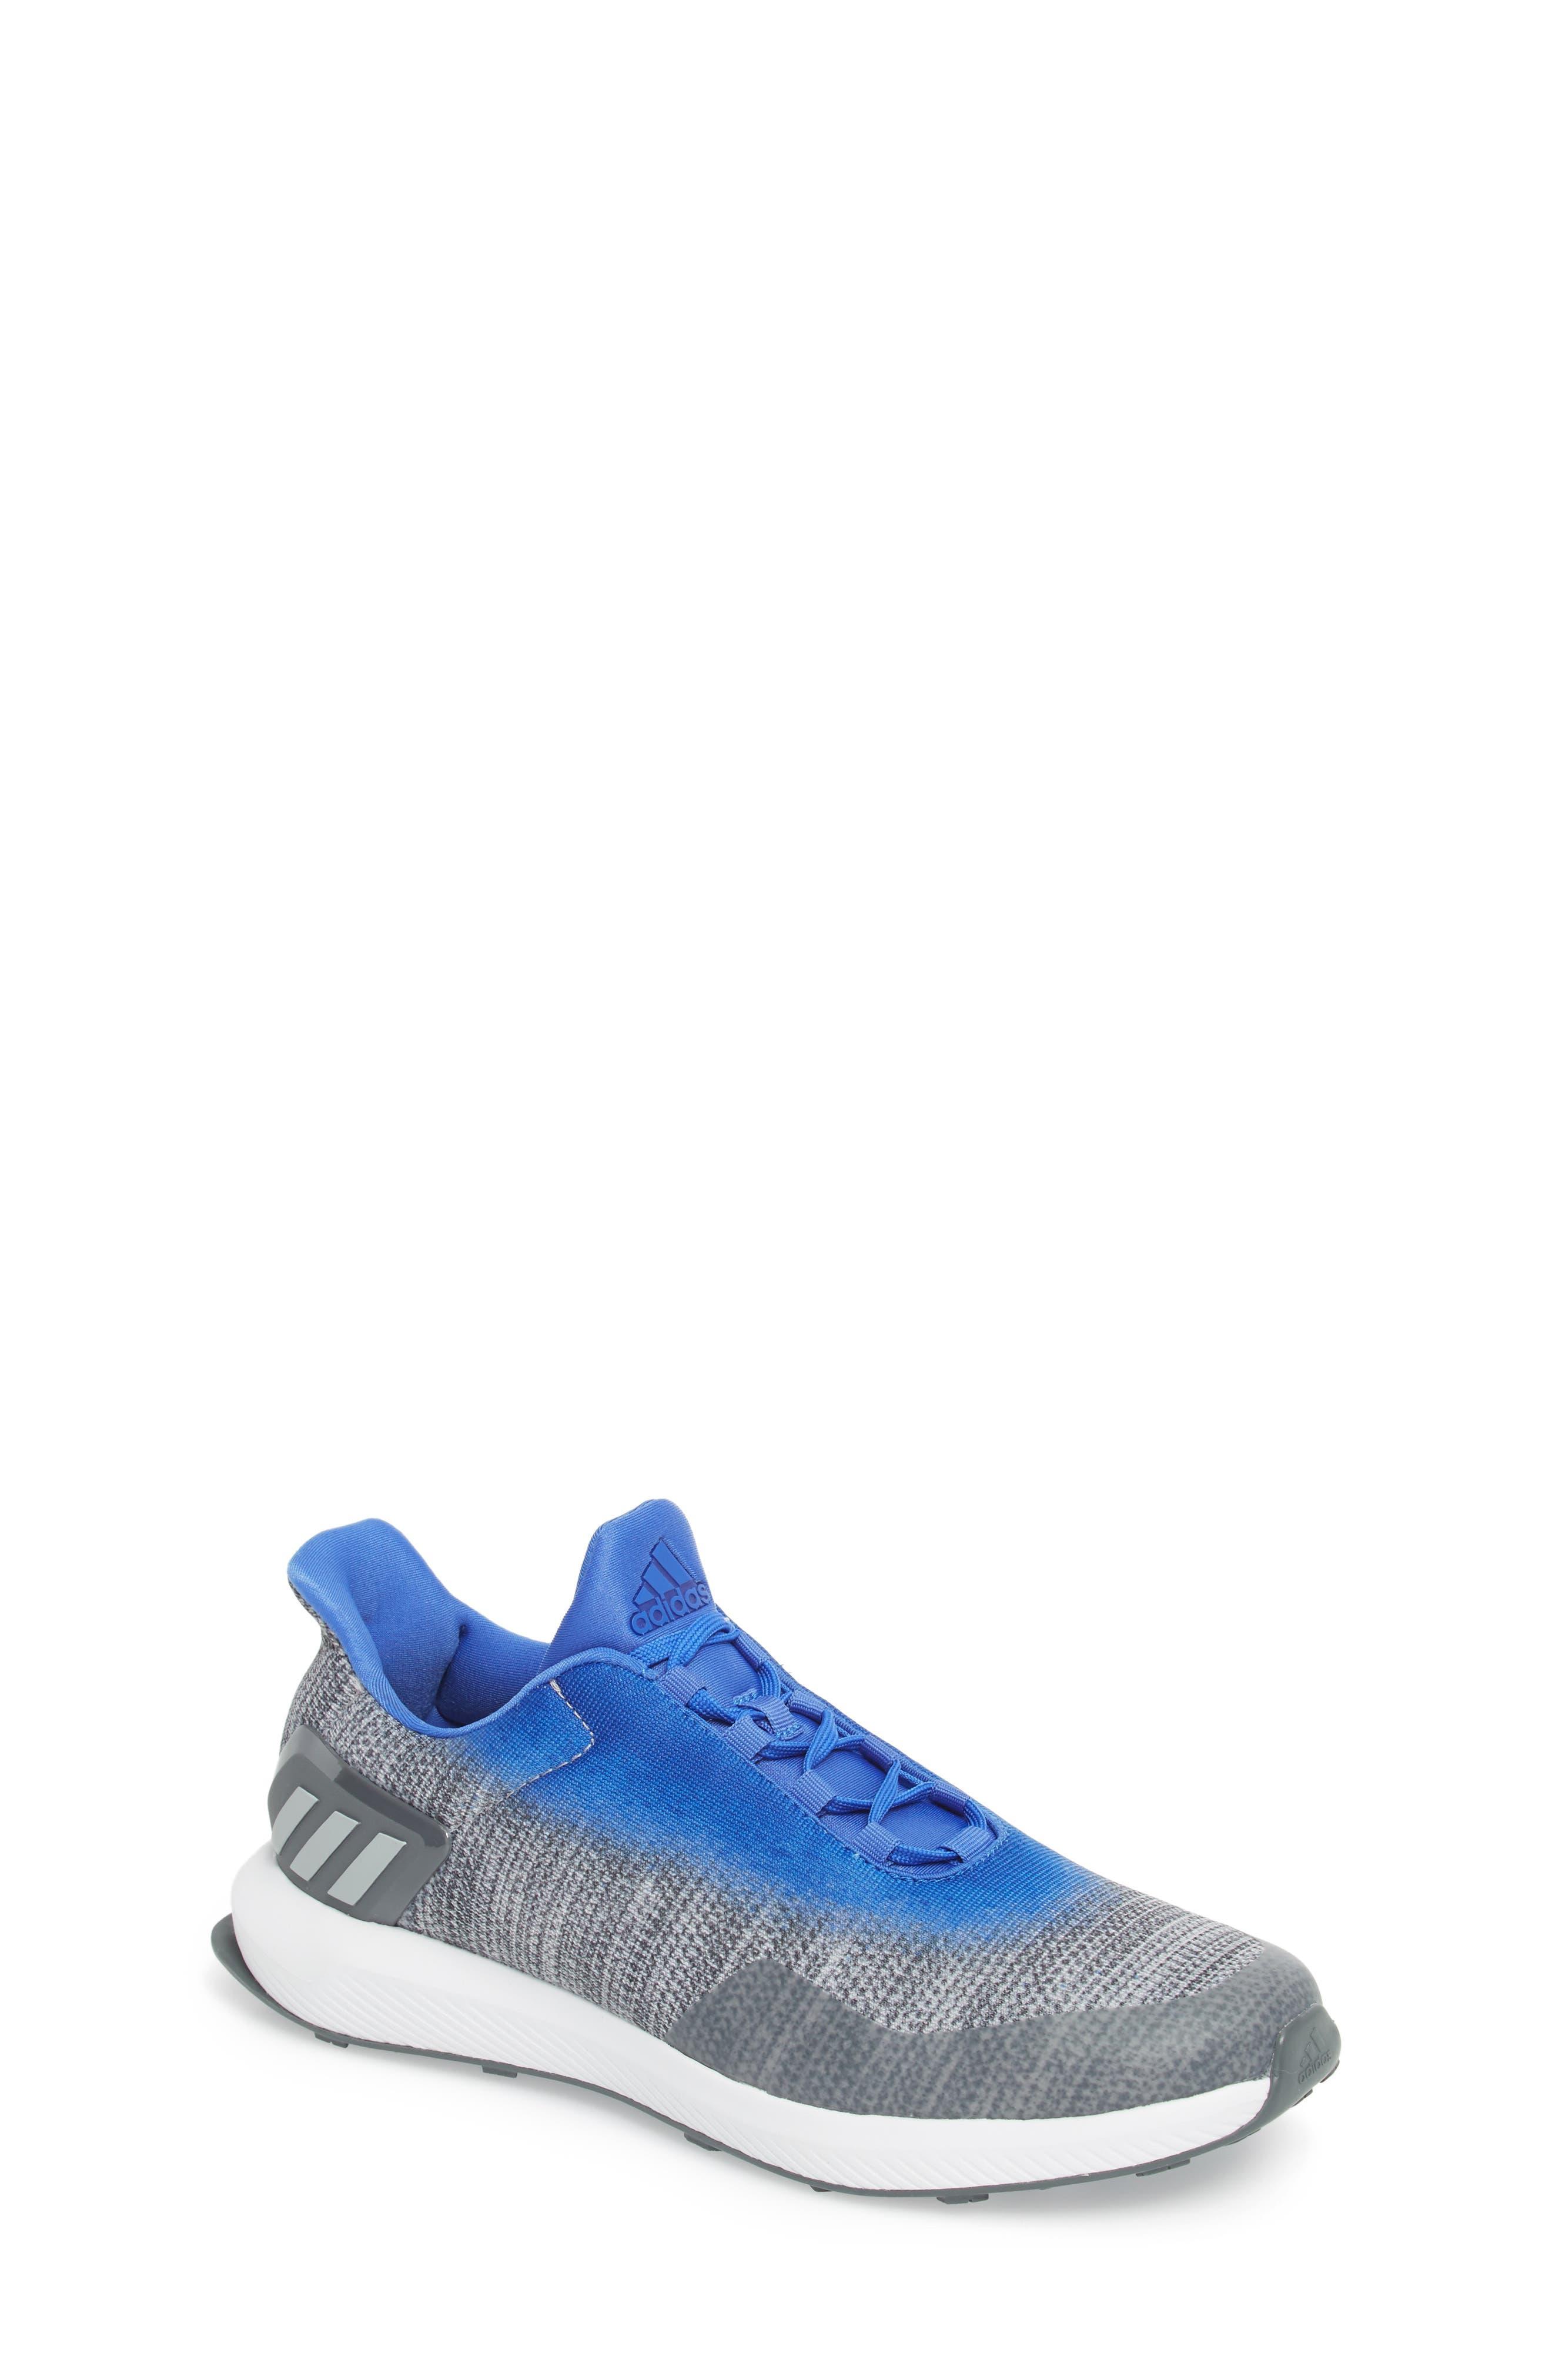 RapidaRun Uncaged Sneaker,                         Main,                         color, 021